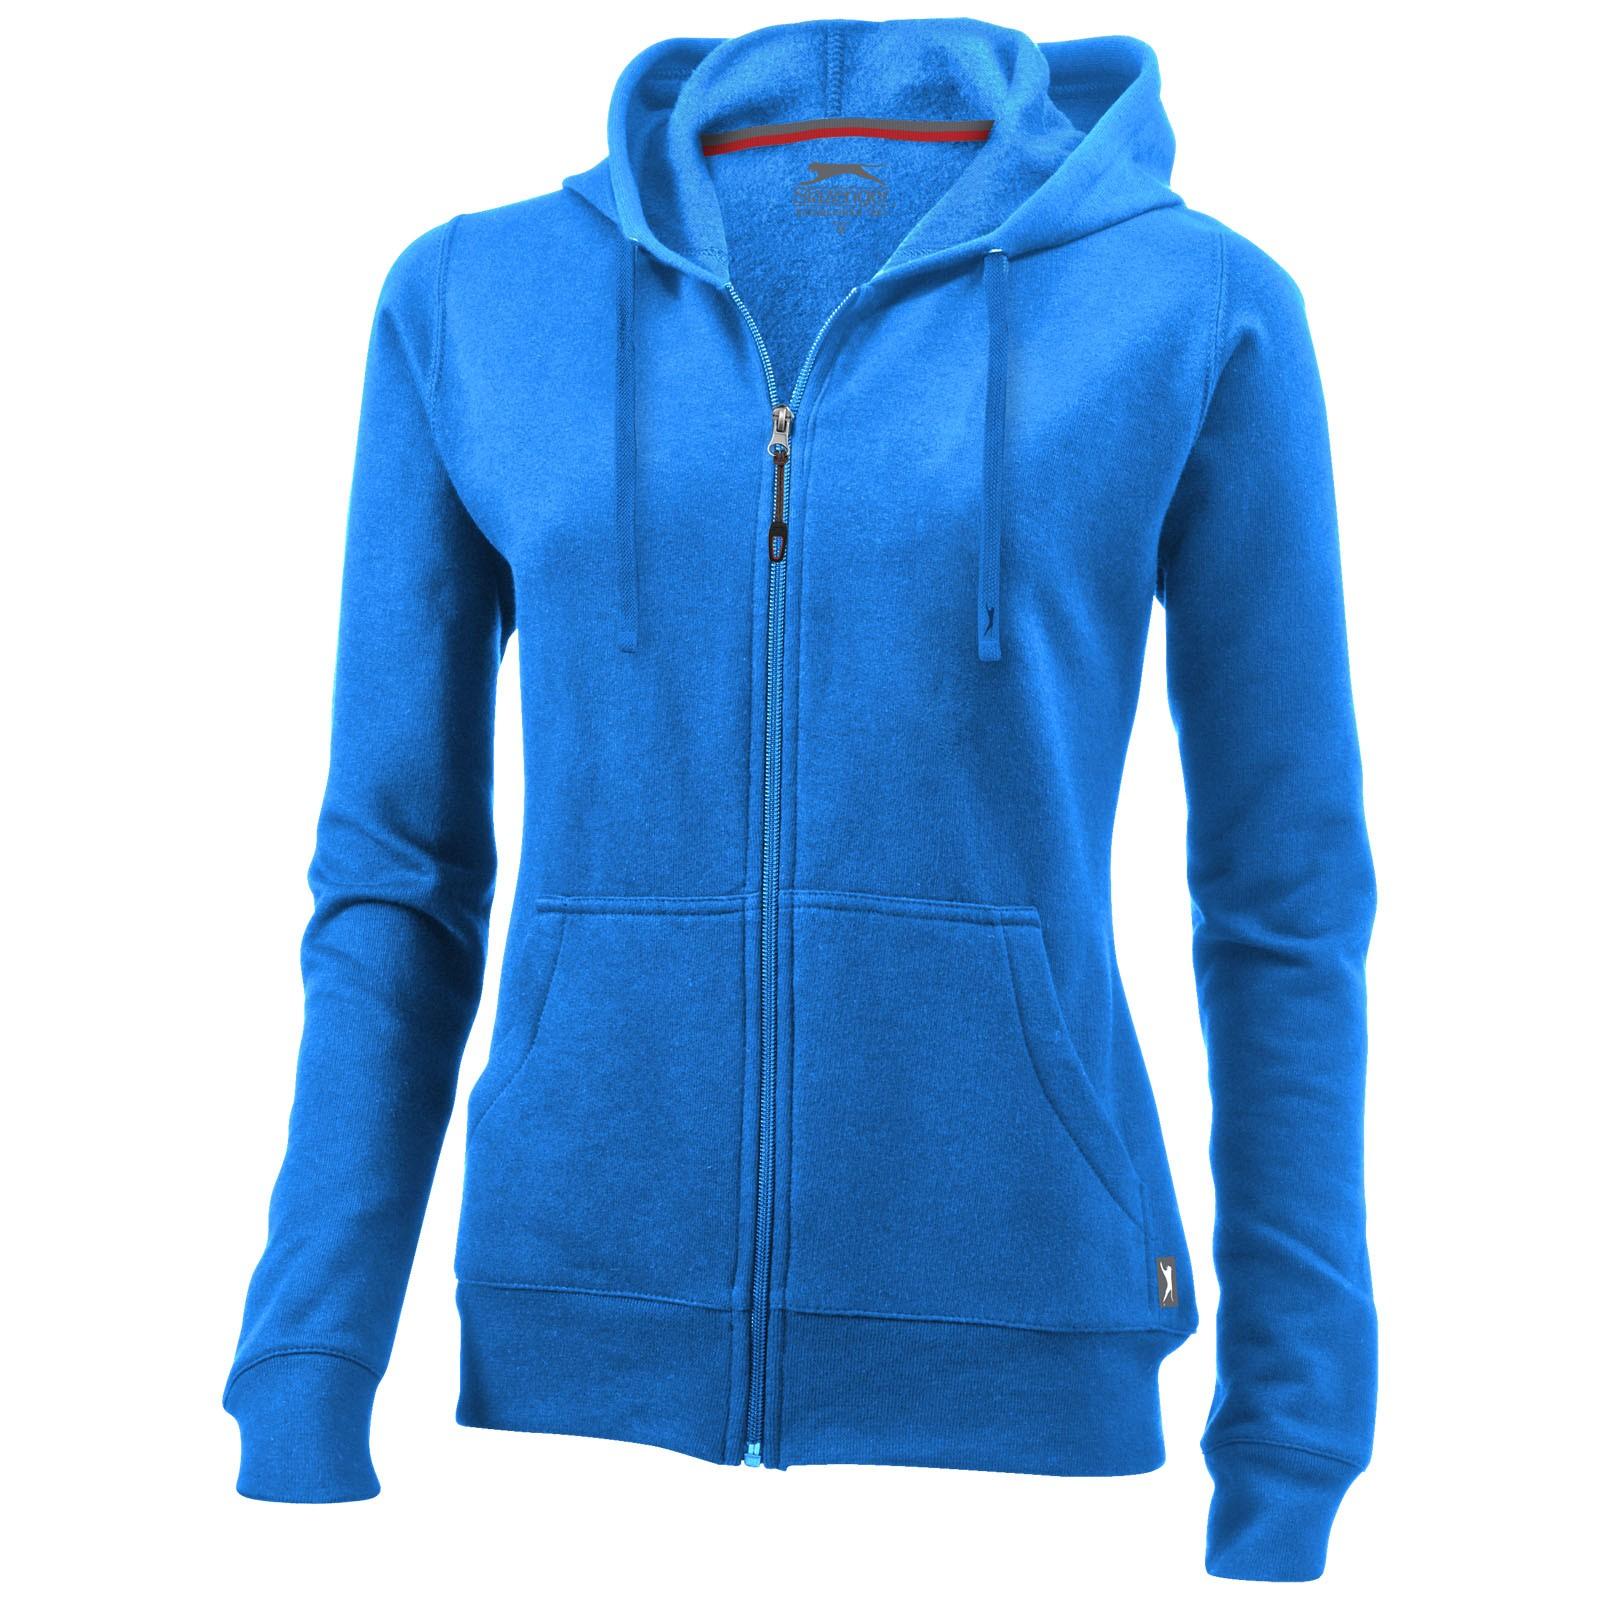 Open full zip hooded ladies sweater - Sky blue / L